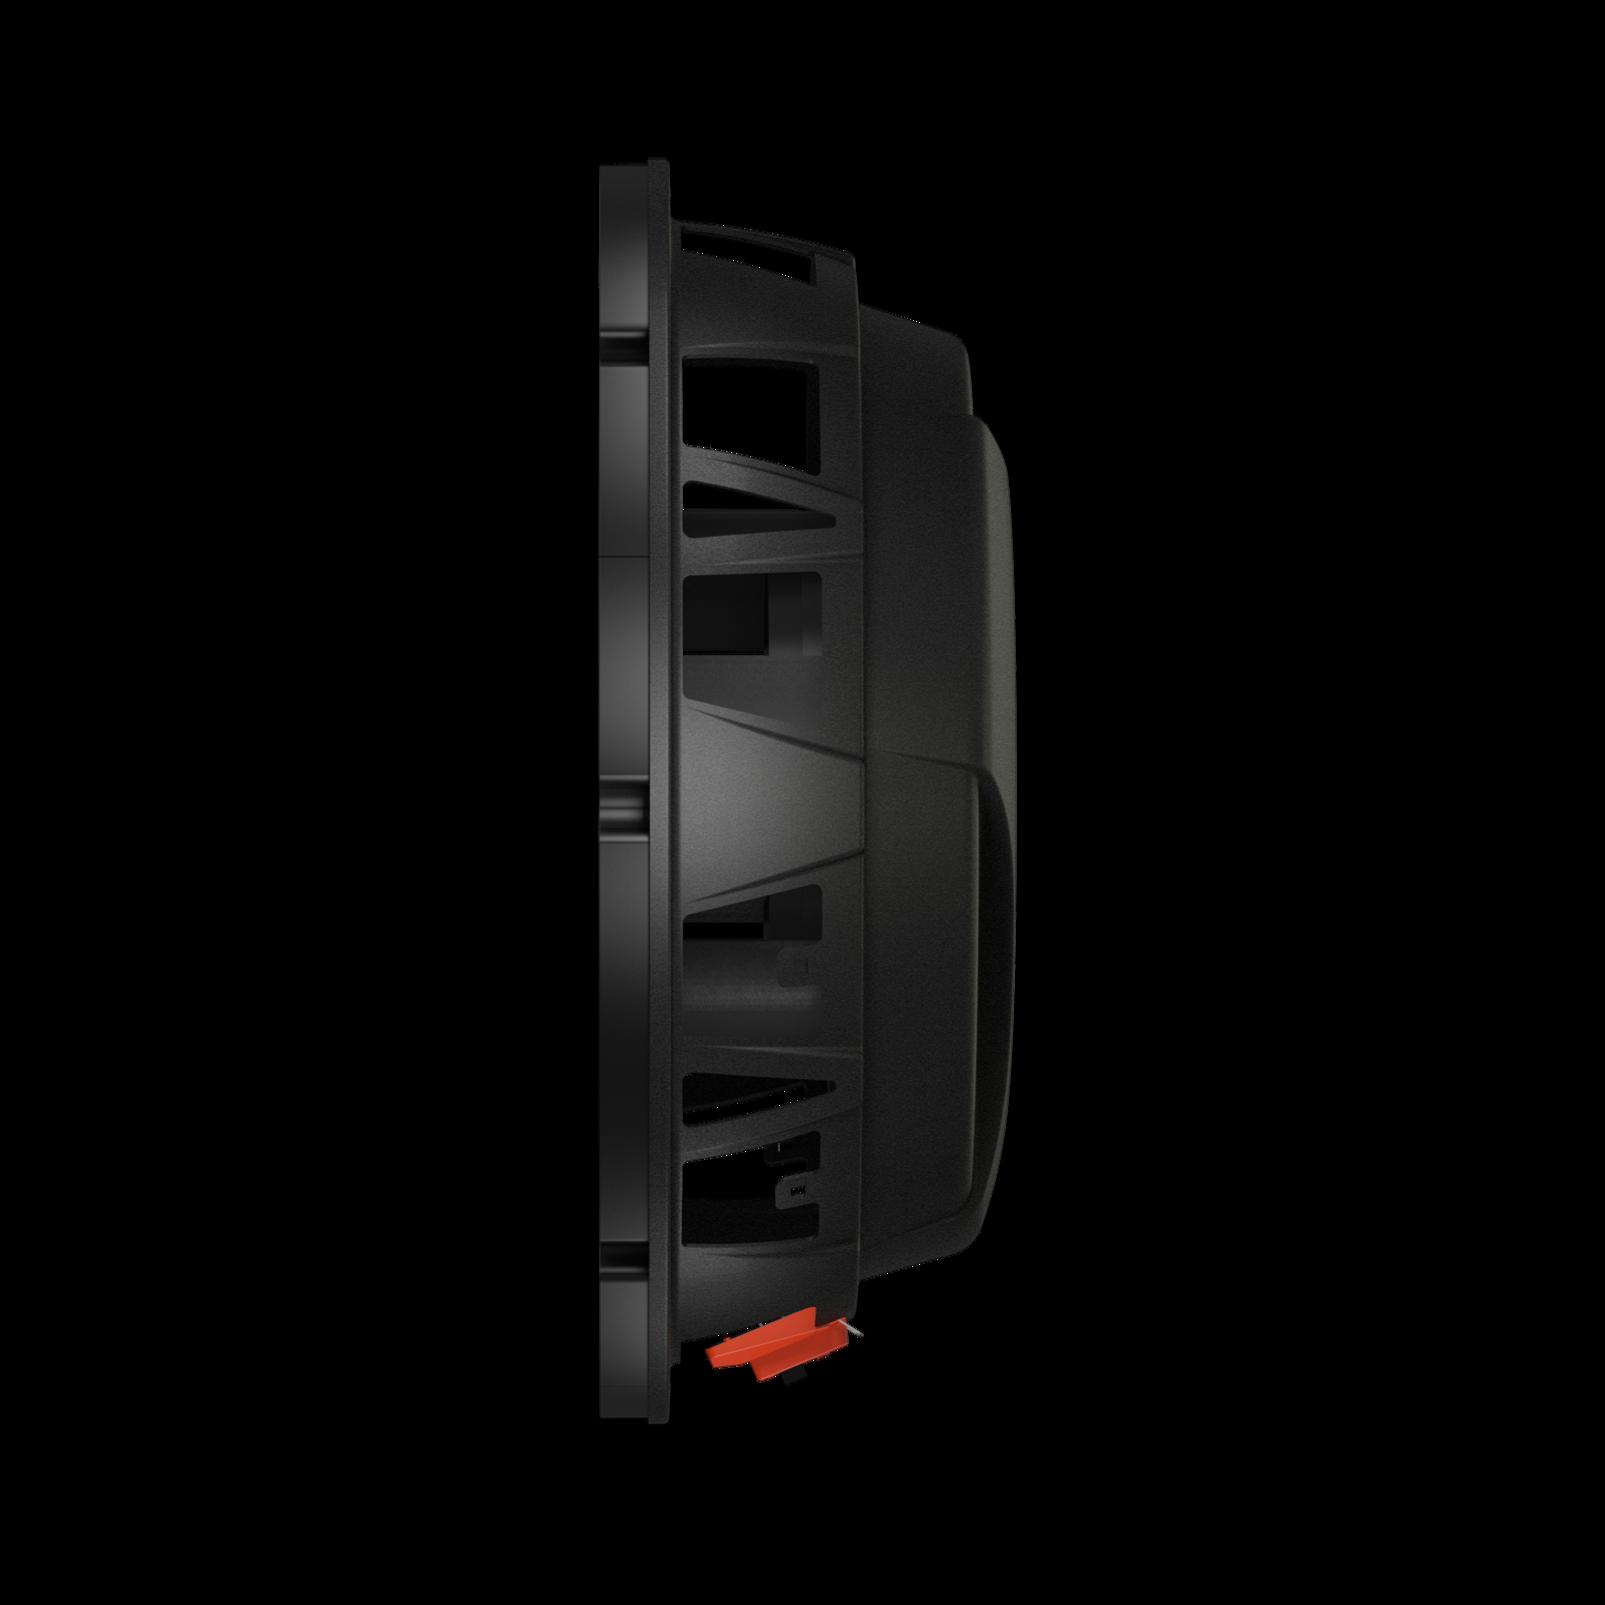 Jbl Club Ws1200 12 Shallow Mount Subwoofer Wiring 4 Ohm Diagram Speaker Cabi